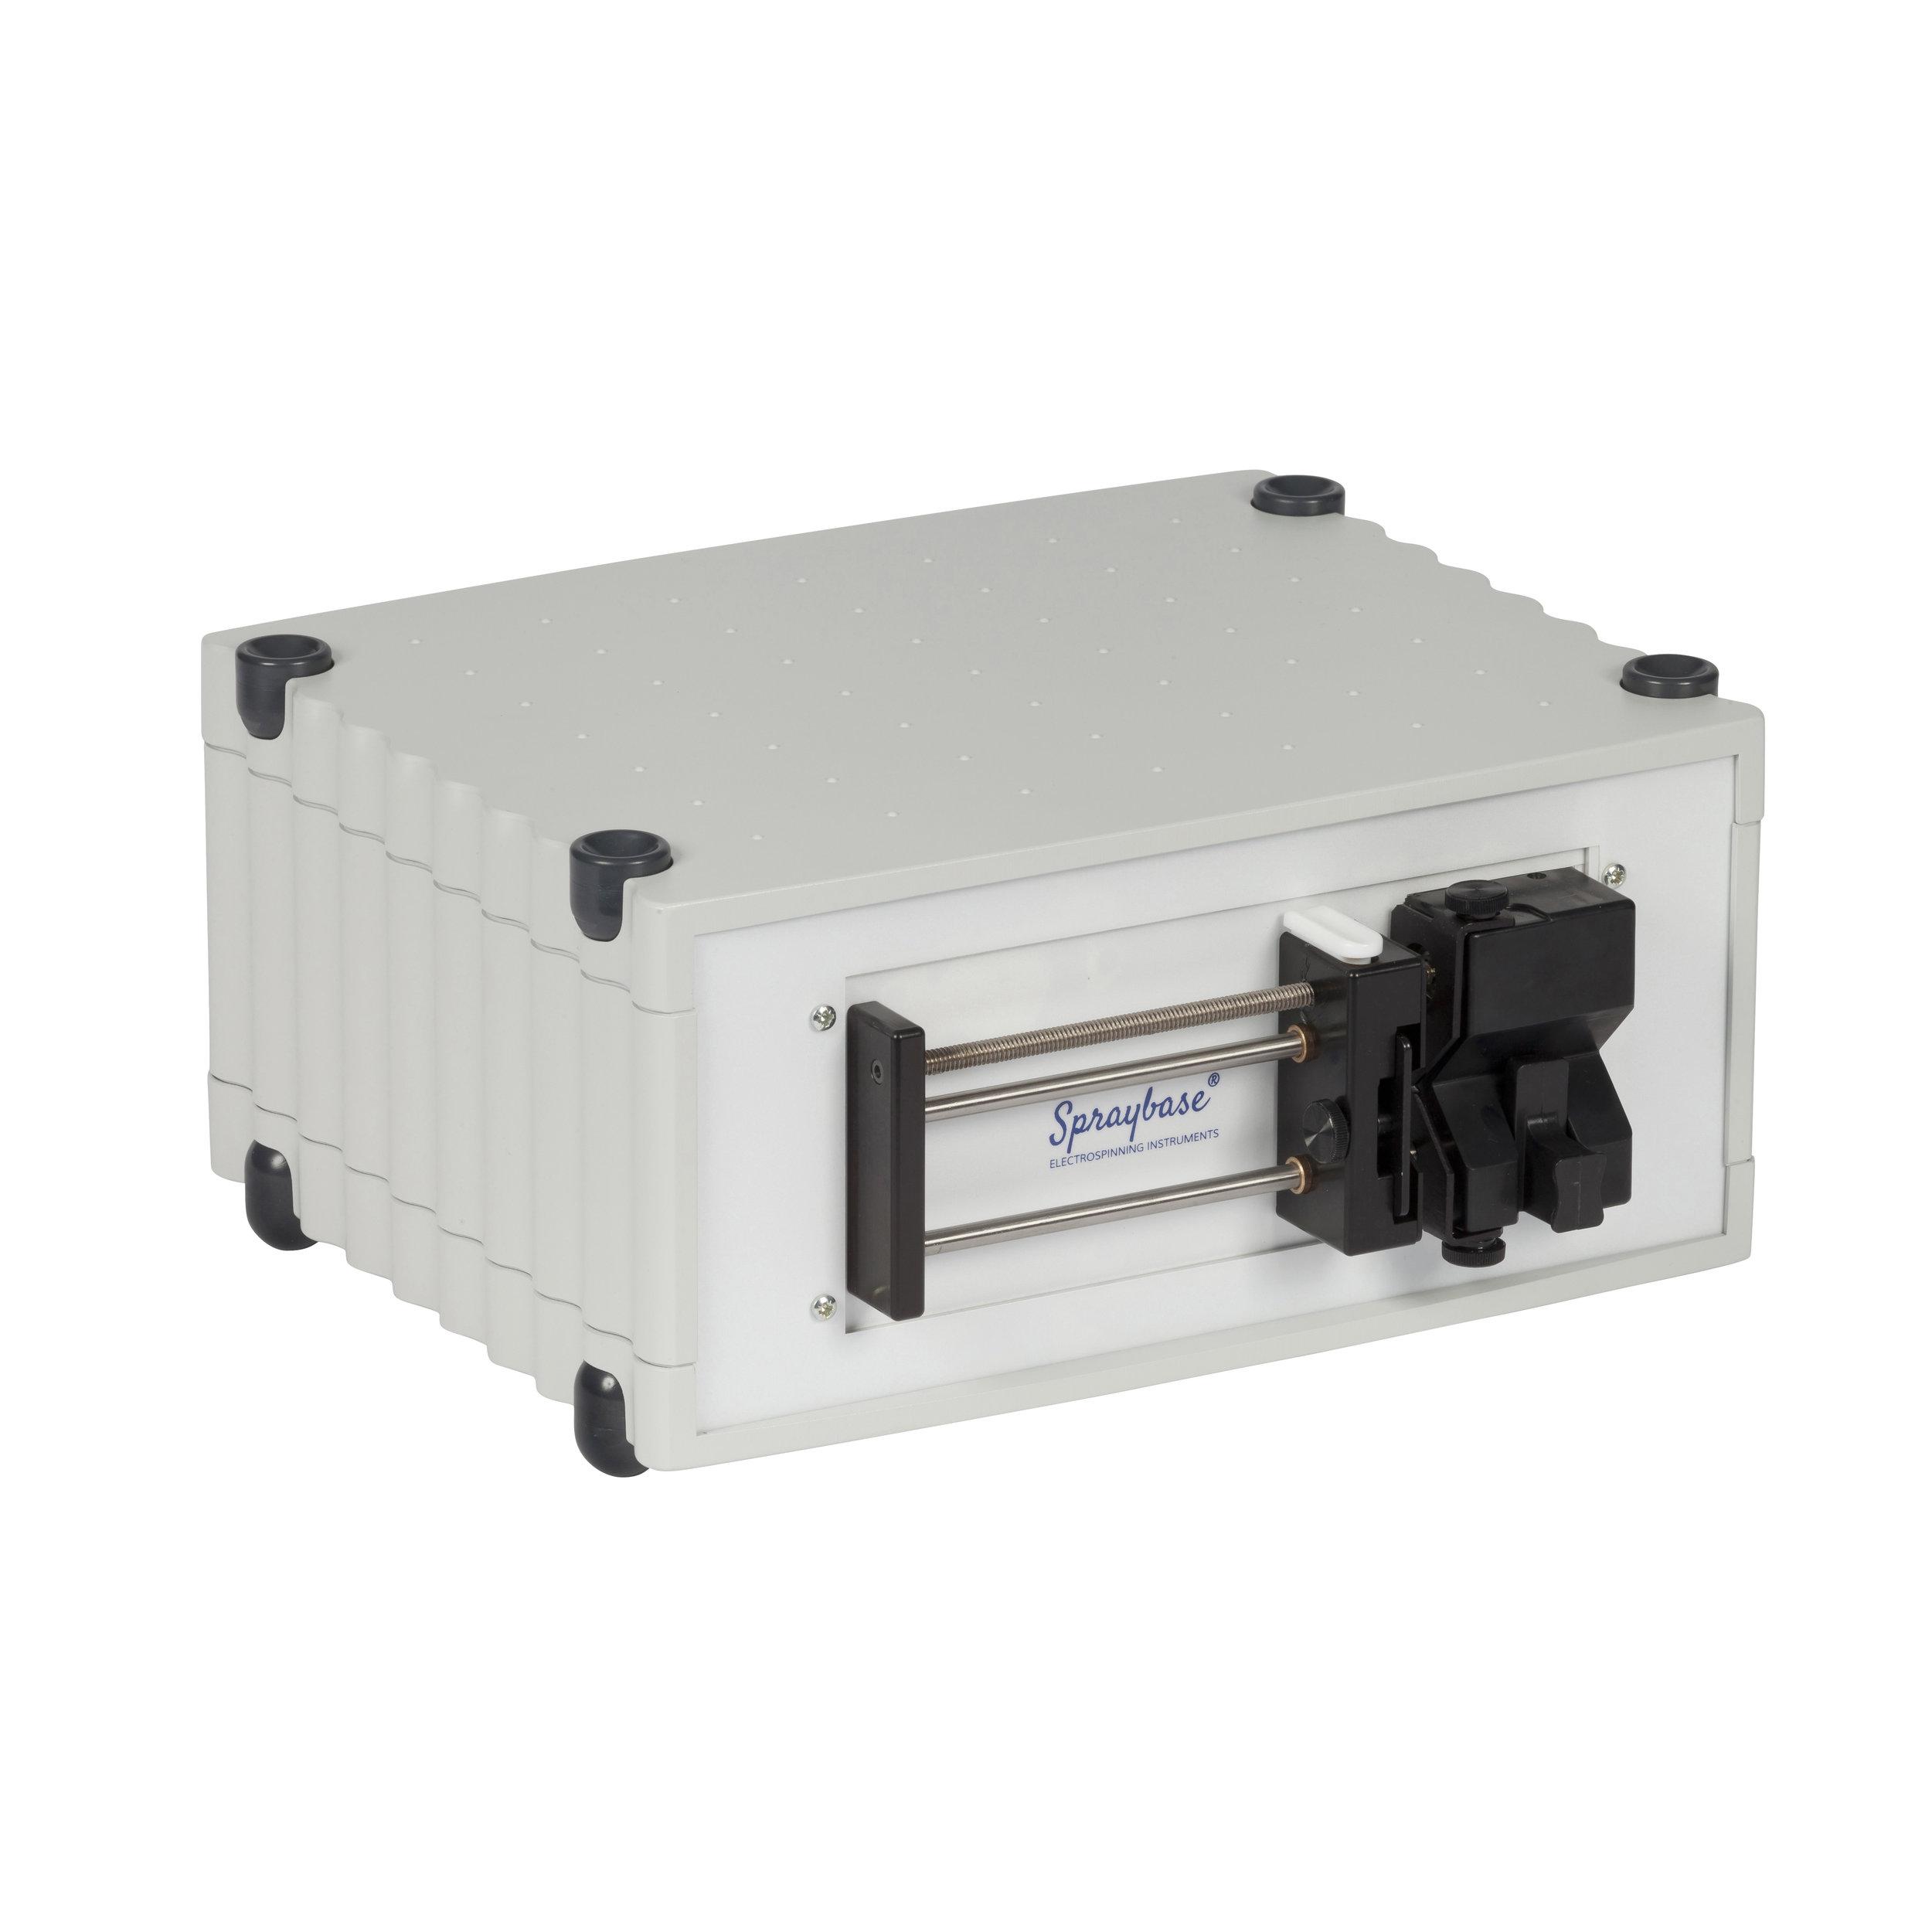 Spraybase® Syringe Pump   A-0004-0001-01